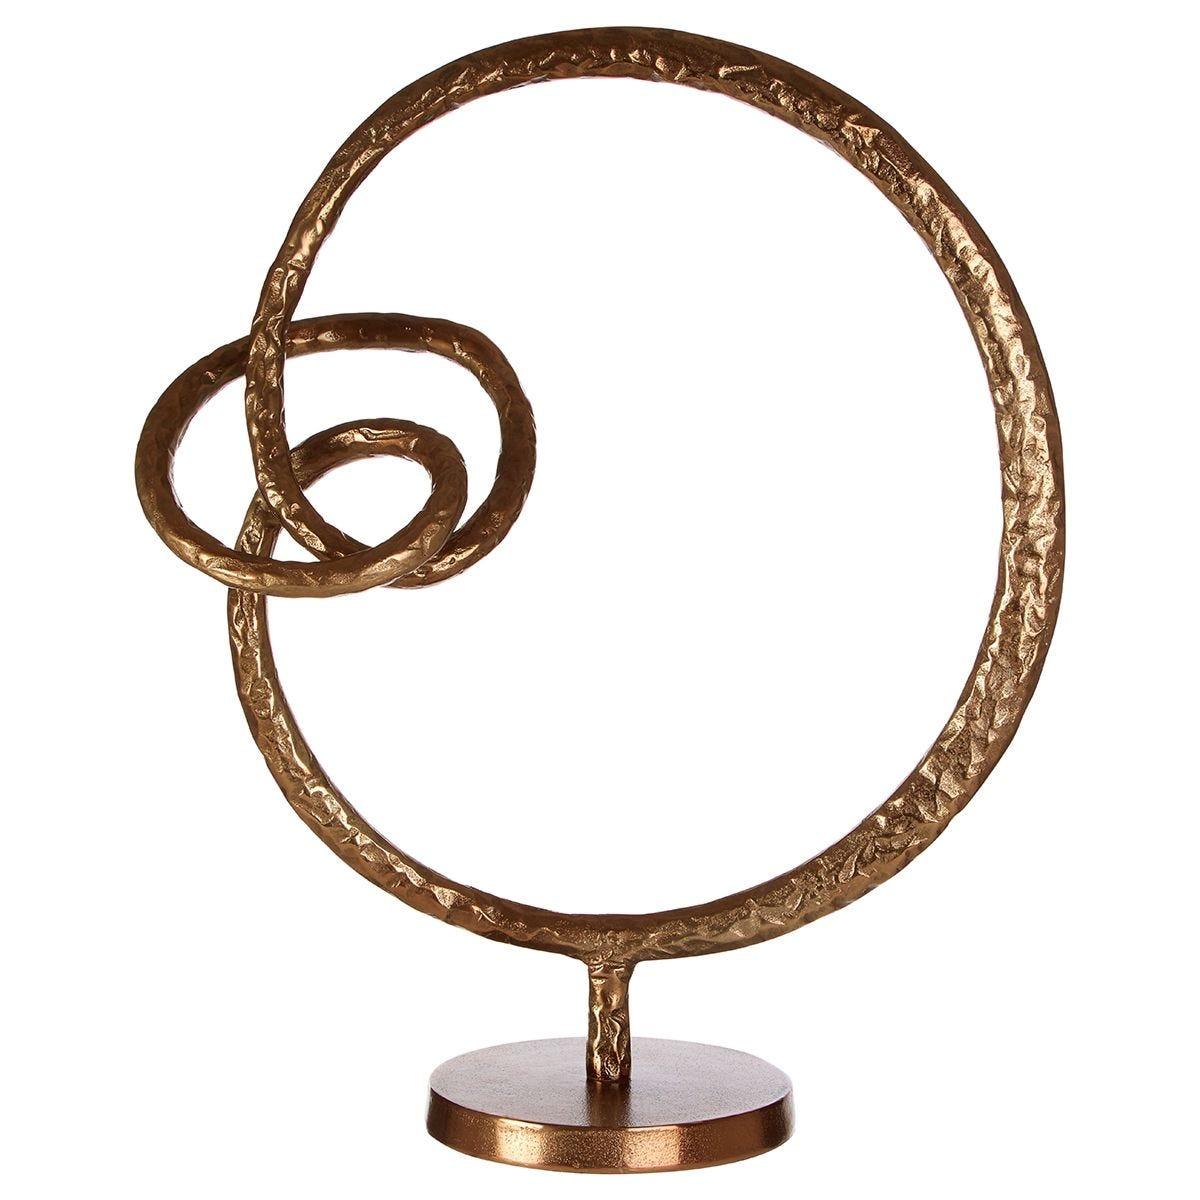 Premier Housewares Nexus Round Sculpture - Rough Bronze Finish